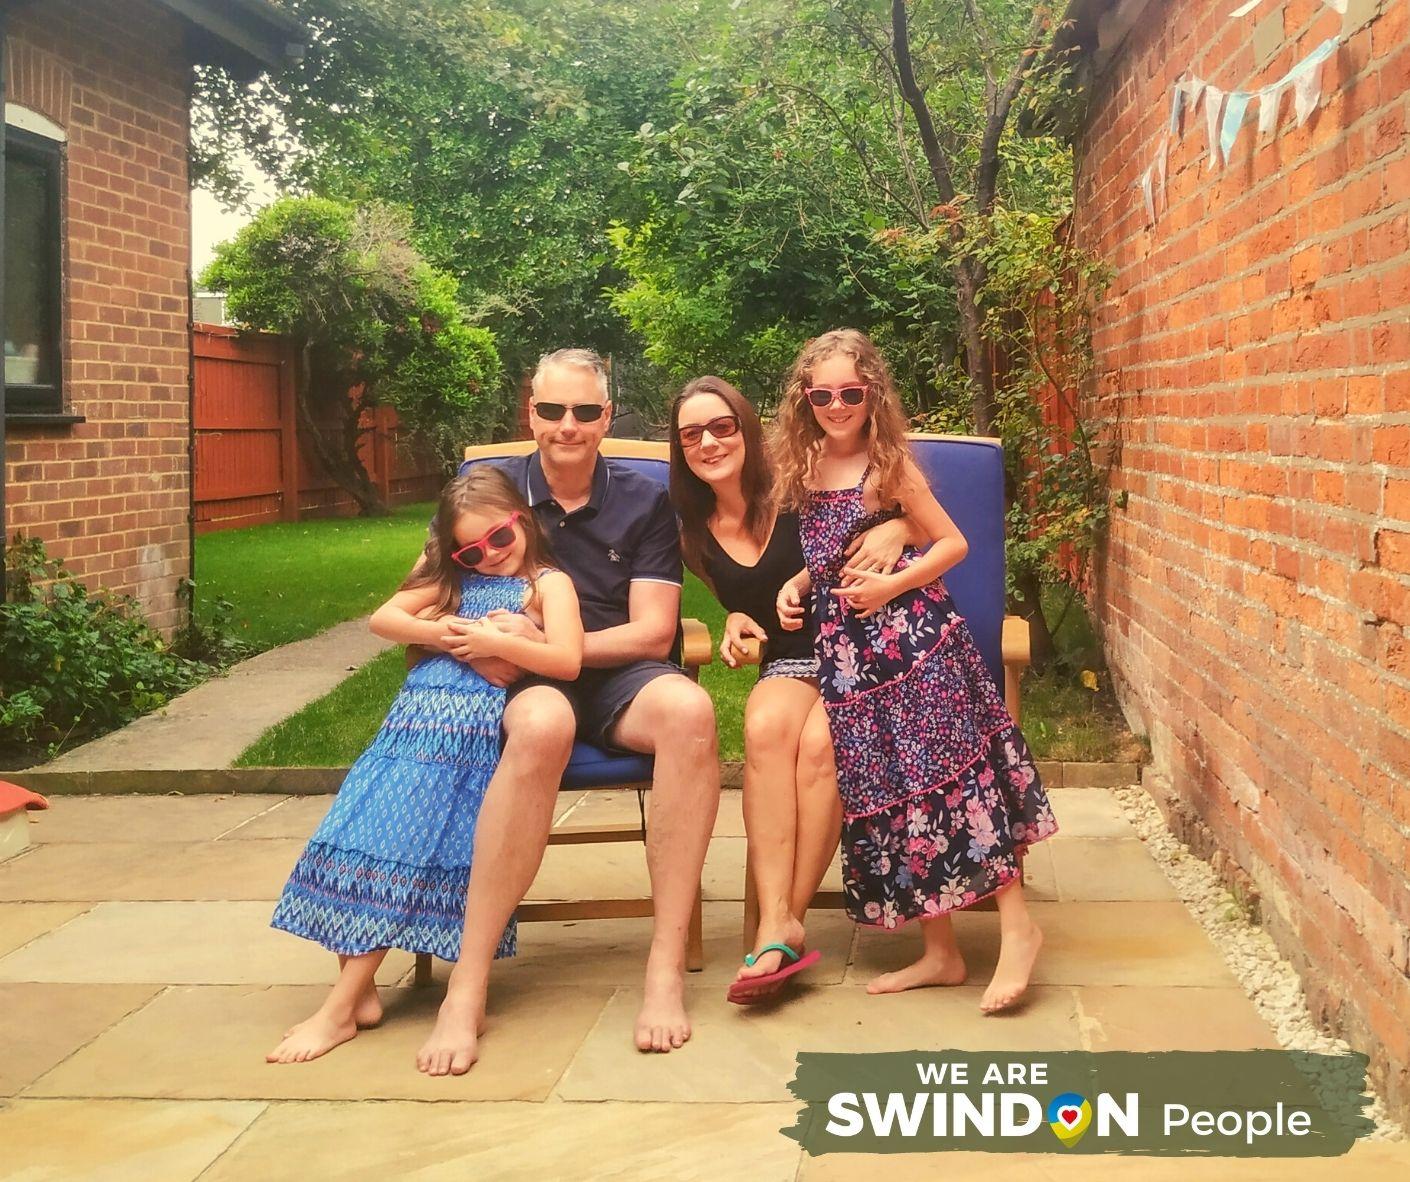 We Are Swindon People Michelle Jones